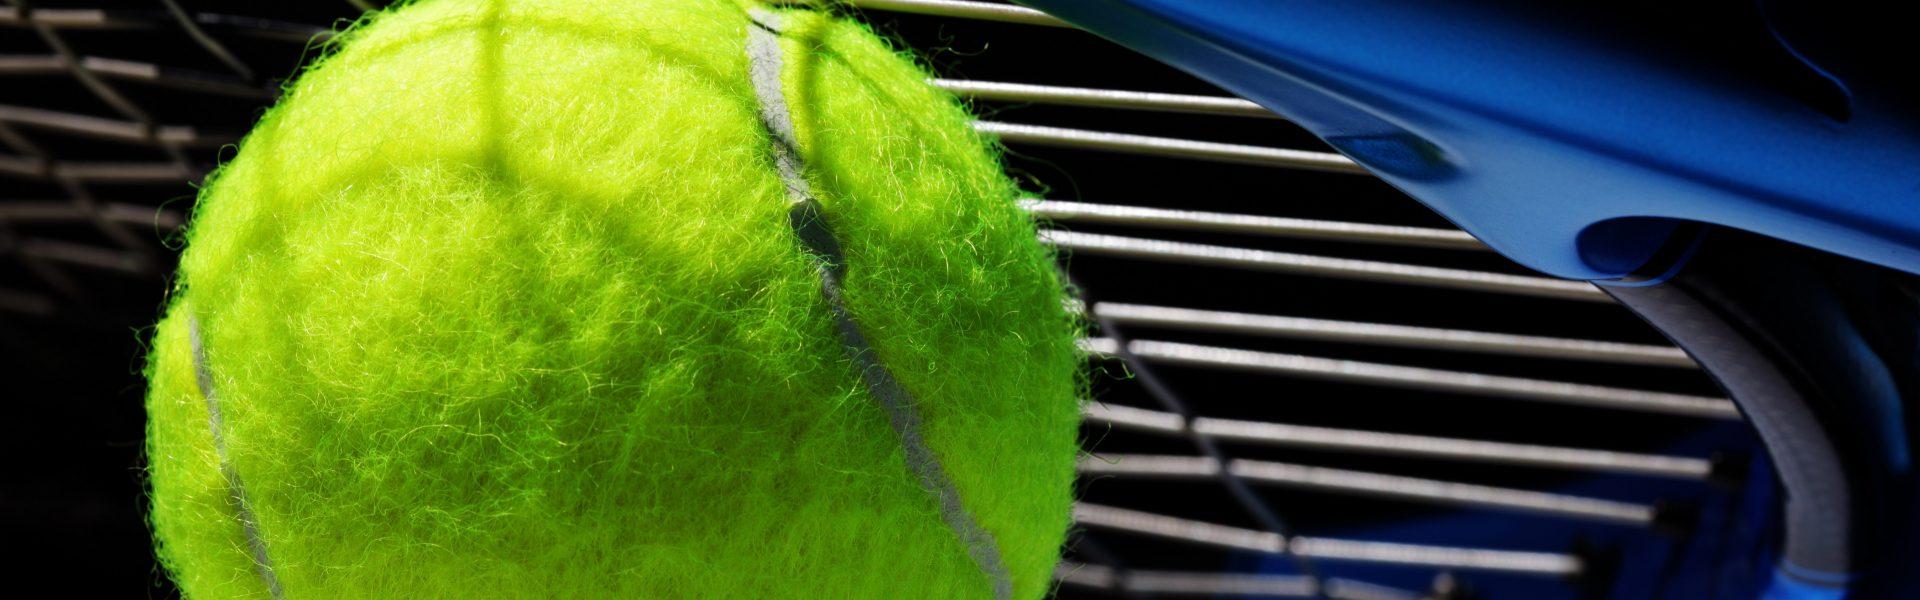 TV Rellinghausen 91/24 e.V. | Abteilung Tennis